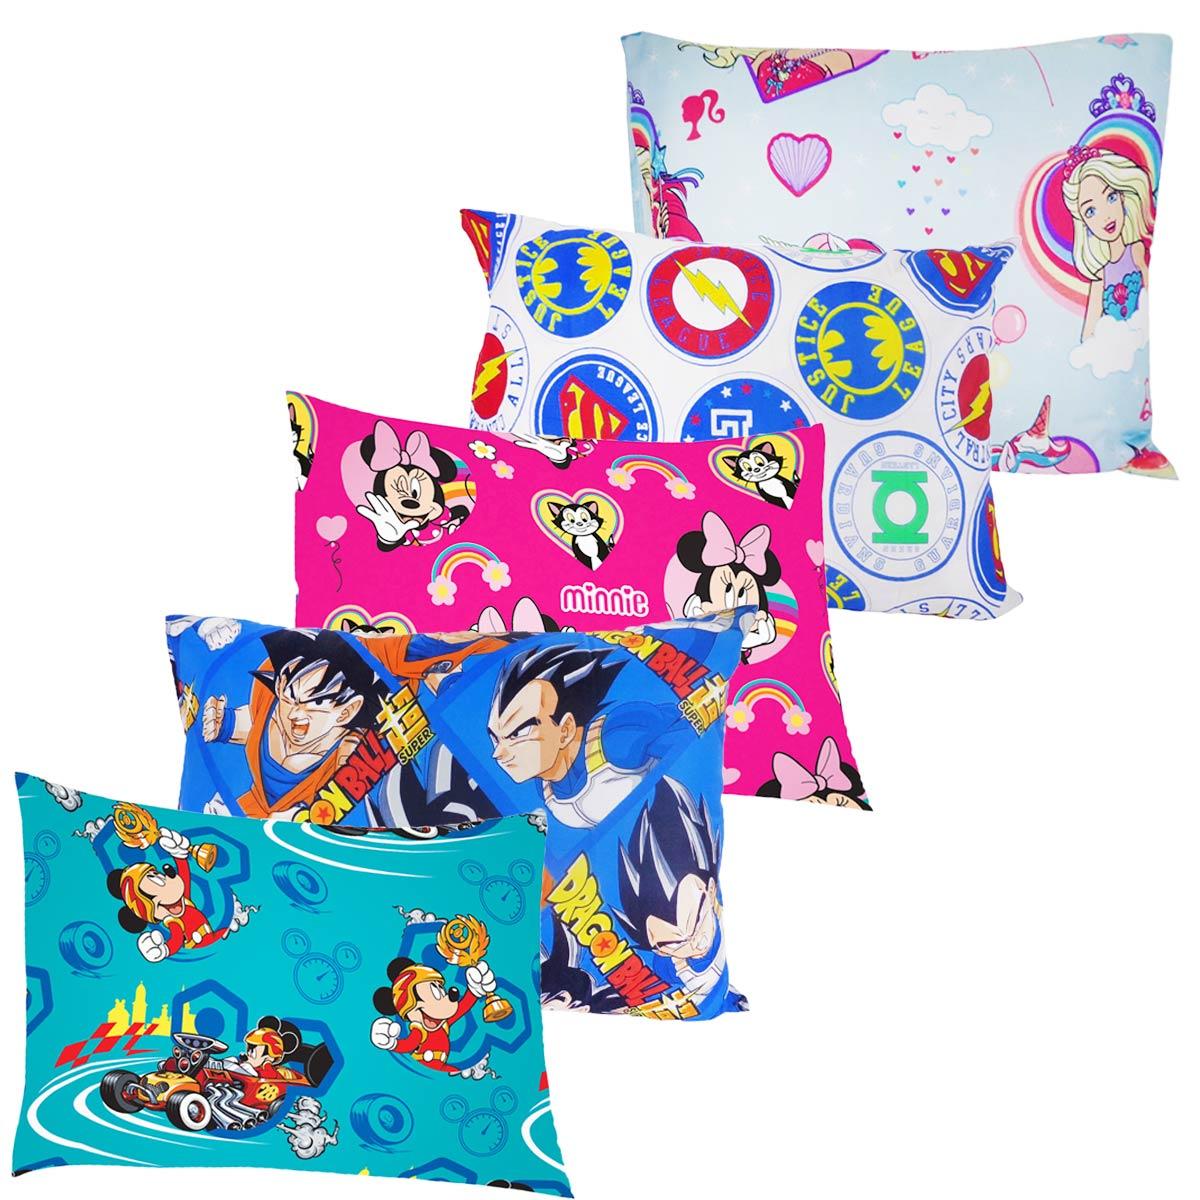 Fronha Infantil Estampada Personagens Disney De Poliéster Avulsa Microfibra 50 cm x 70 cm Lepper